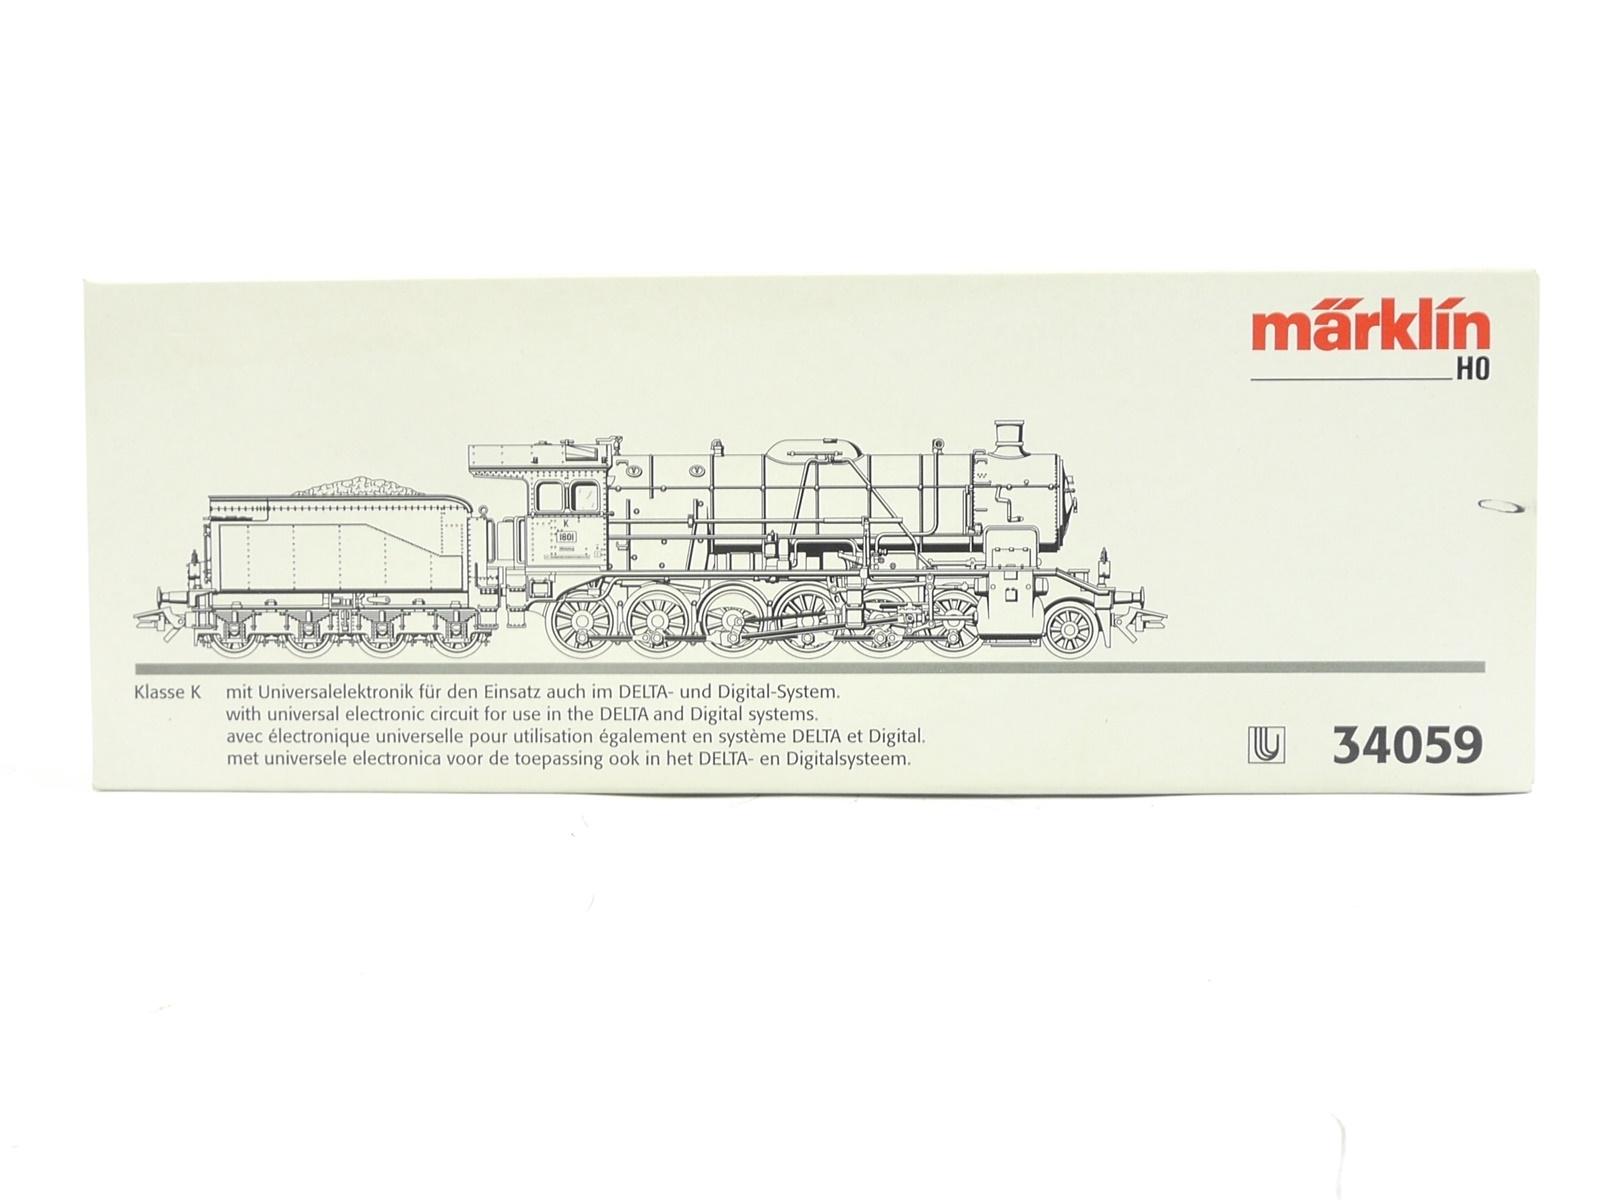 E116 Märklin H0 34059 Leerverpackung Leerkarton OVP für Dampflok Klasse K